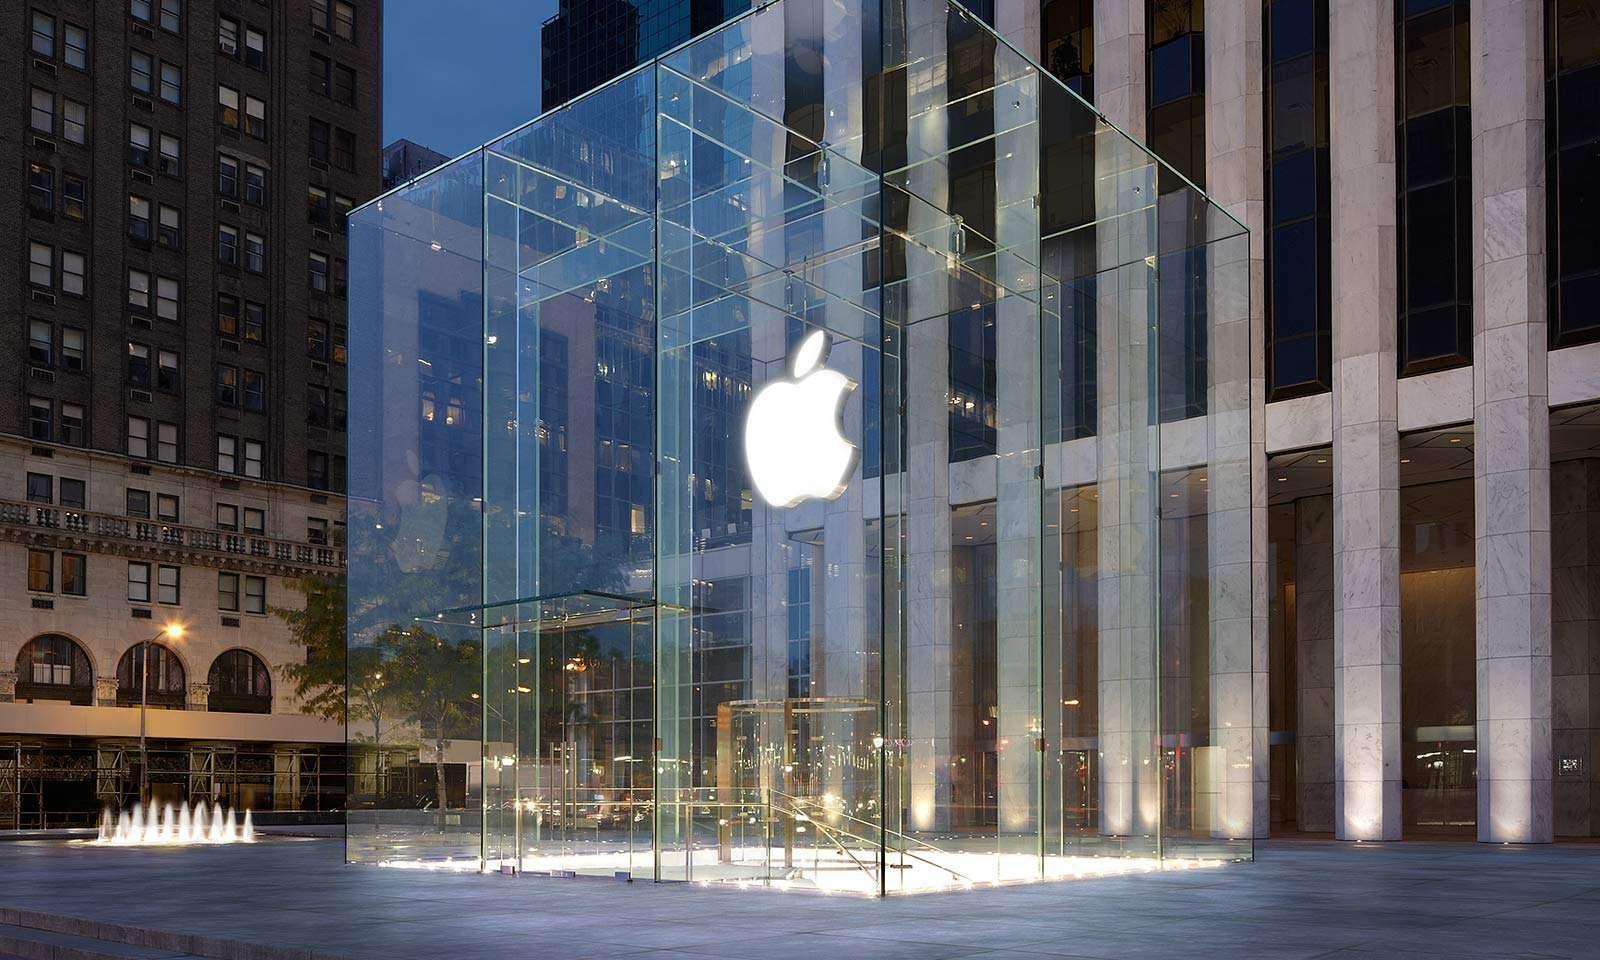 AppleStoreNewYork5thAvenue1600x960.jpg 1,600×960